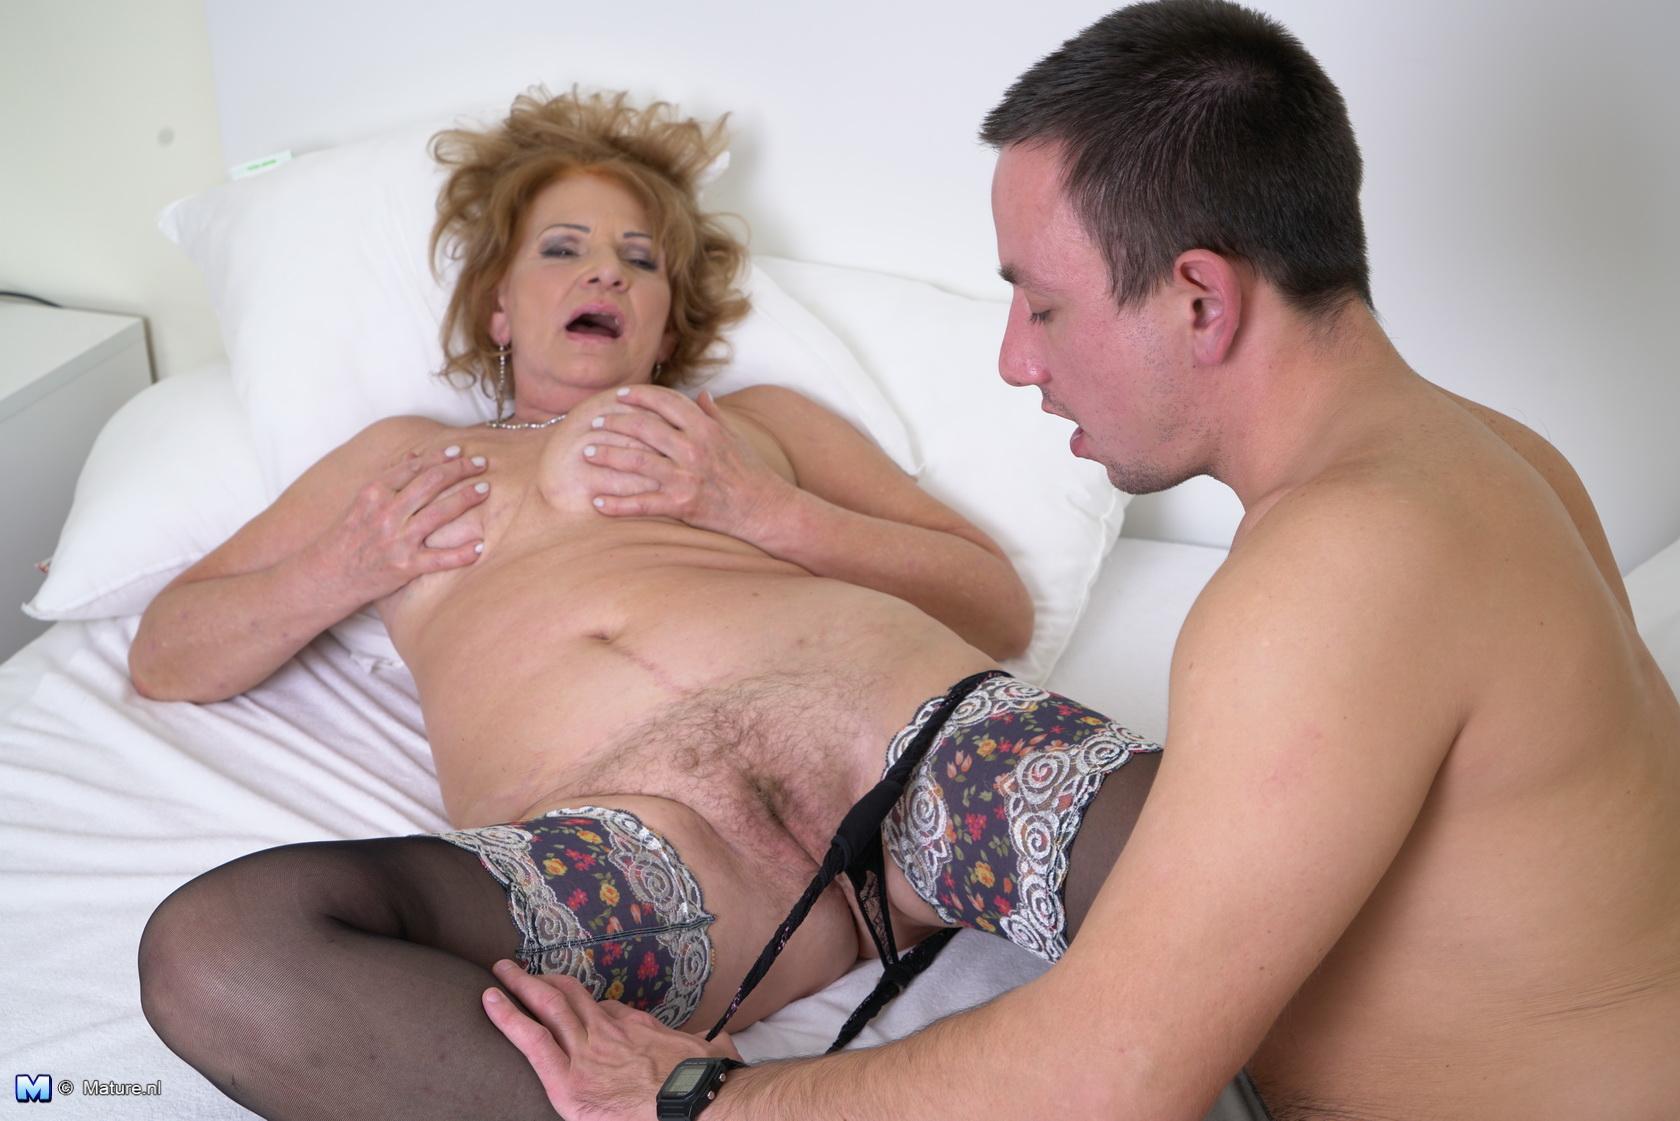 Bbw mature housewife porn videos